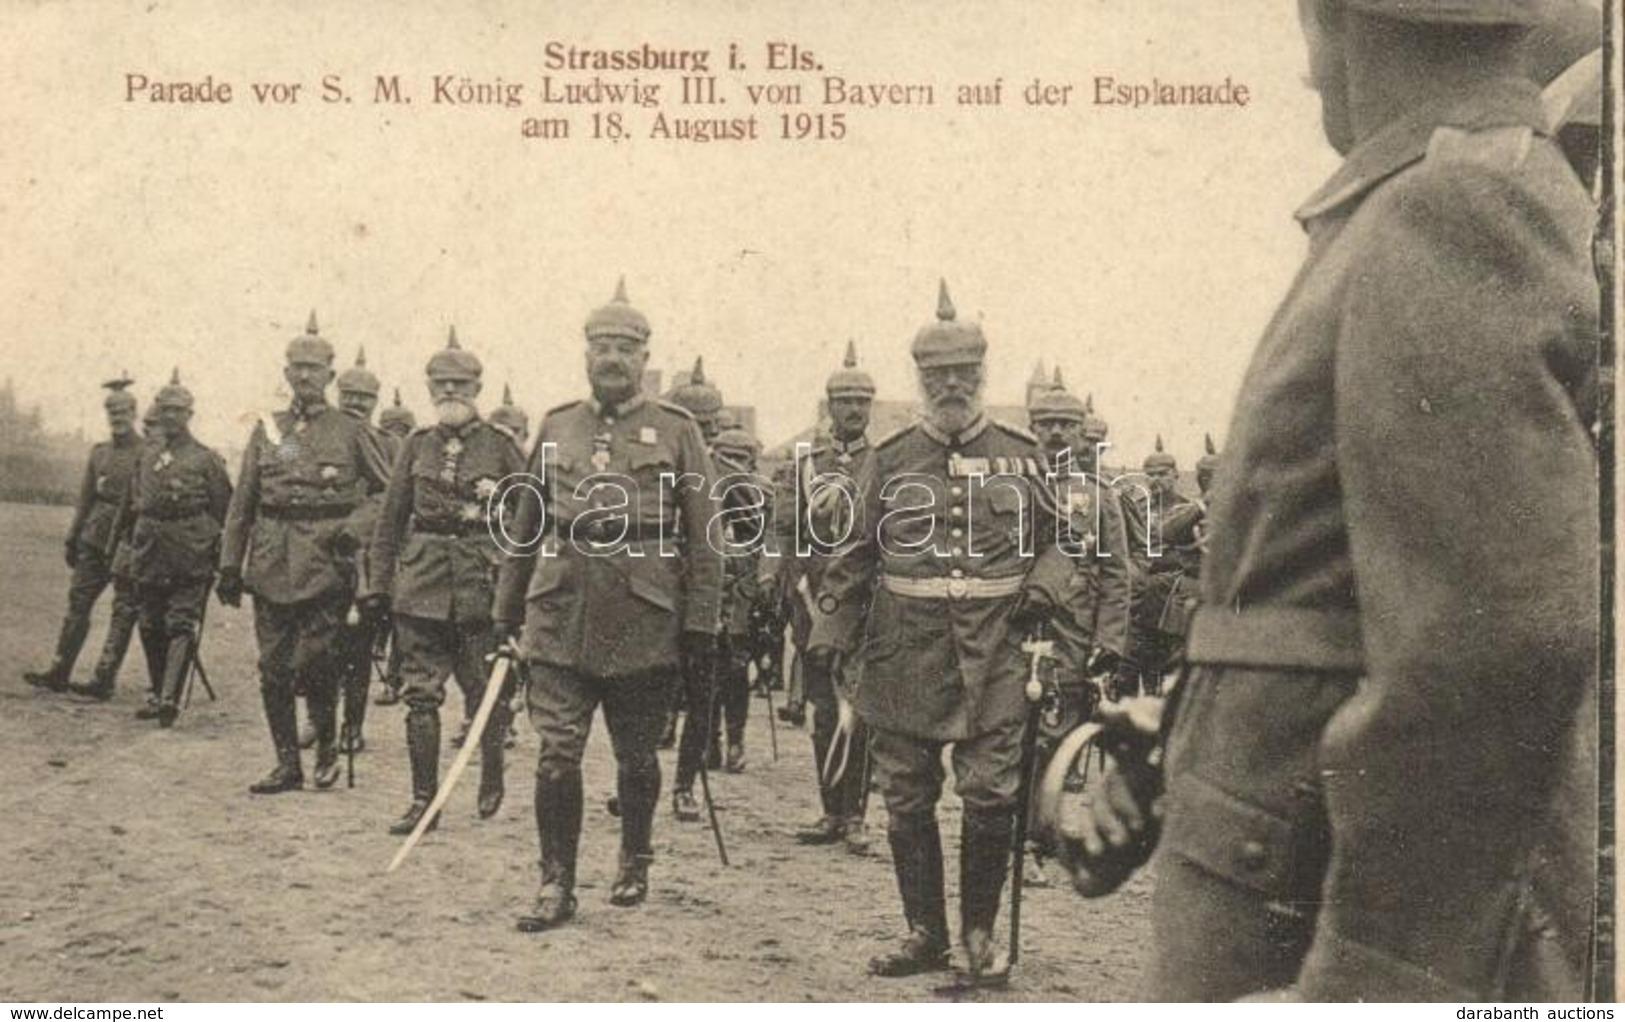 T2 1915 Strasbourg, Ludwig III Of Bavaria, Military Parade - Postcards